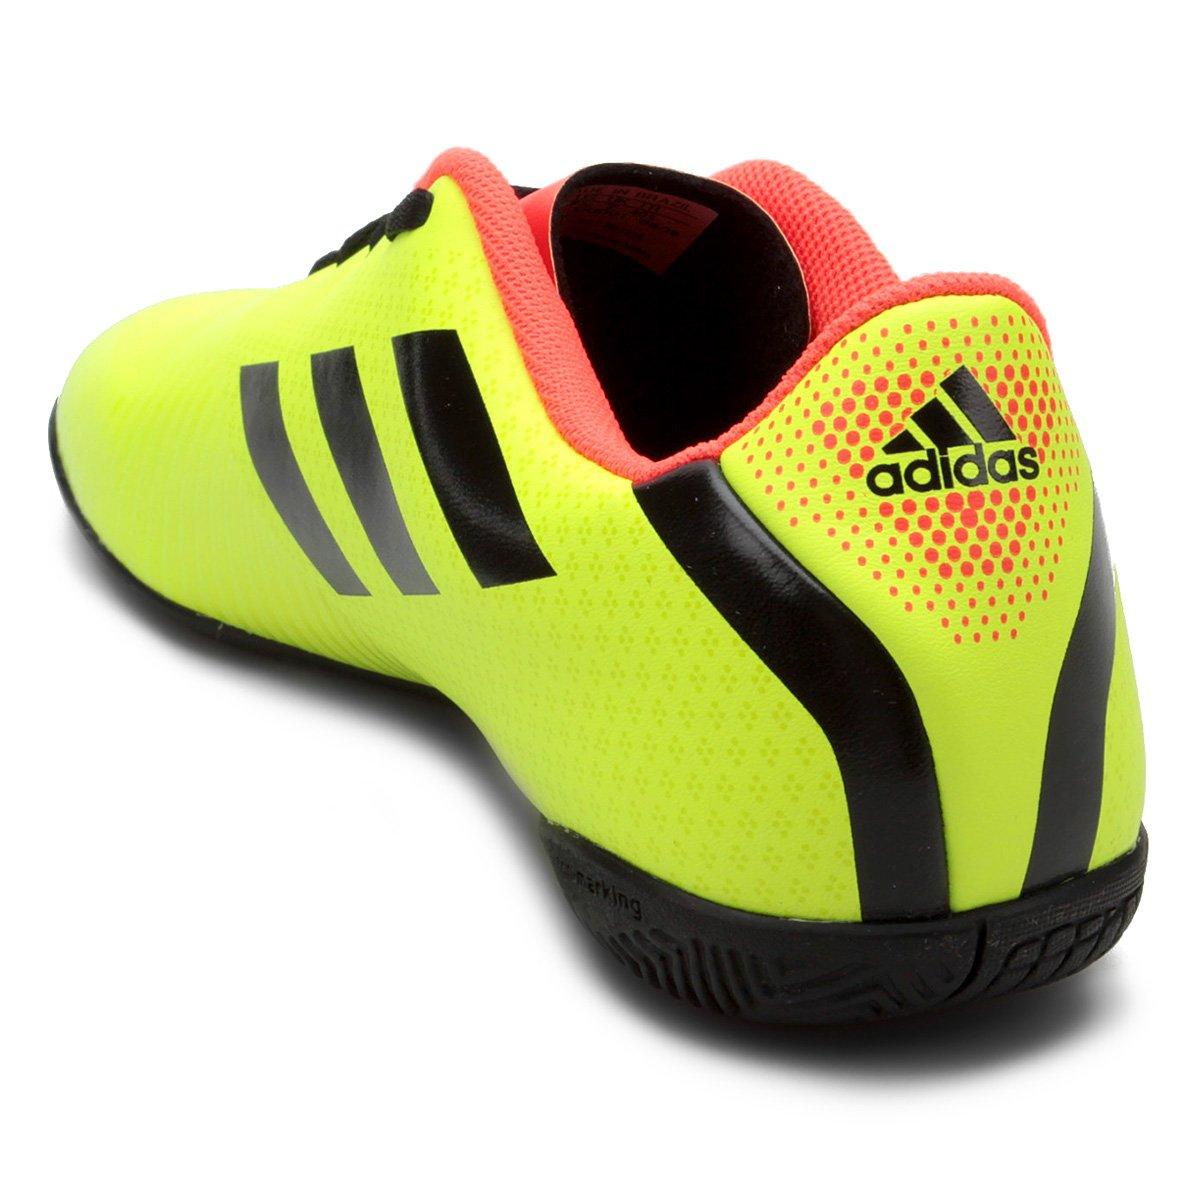 Chuteira Futsal Adidas Artilheira III IN - Amarelo e Preto - Compre ... cef2bc321d0f8